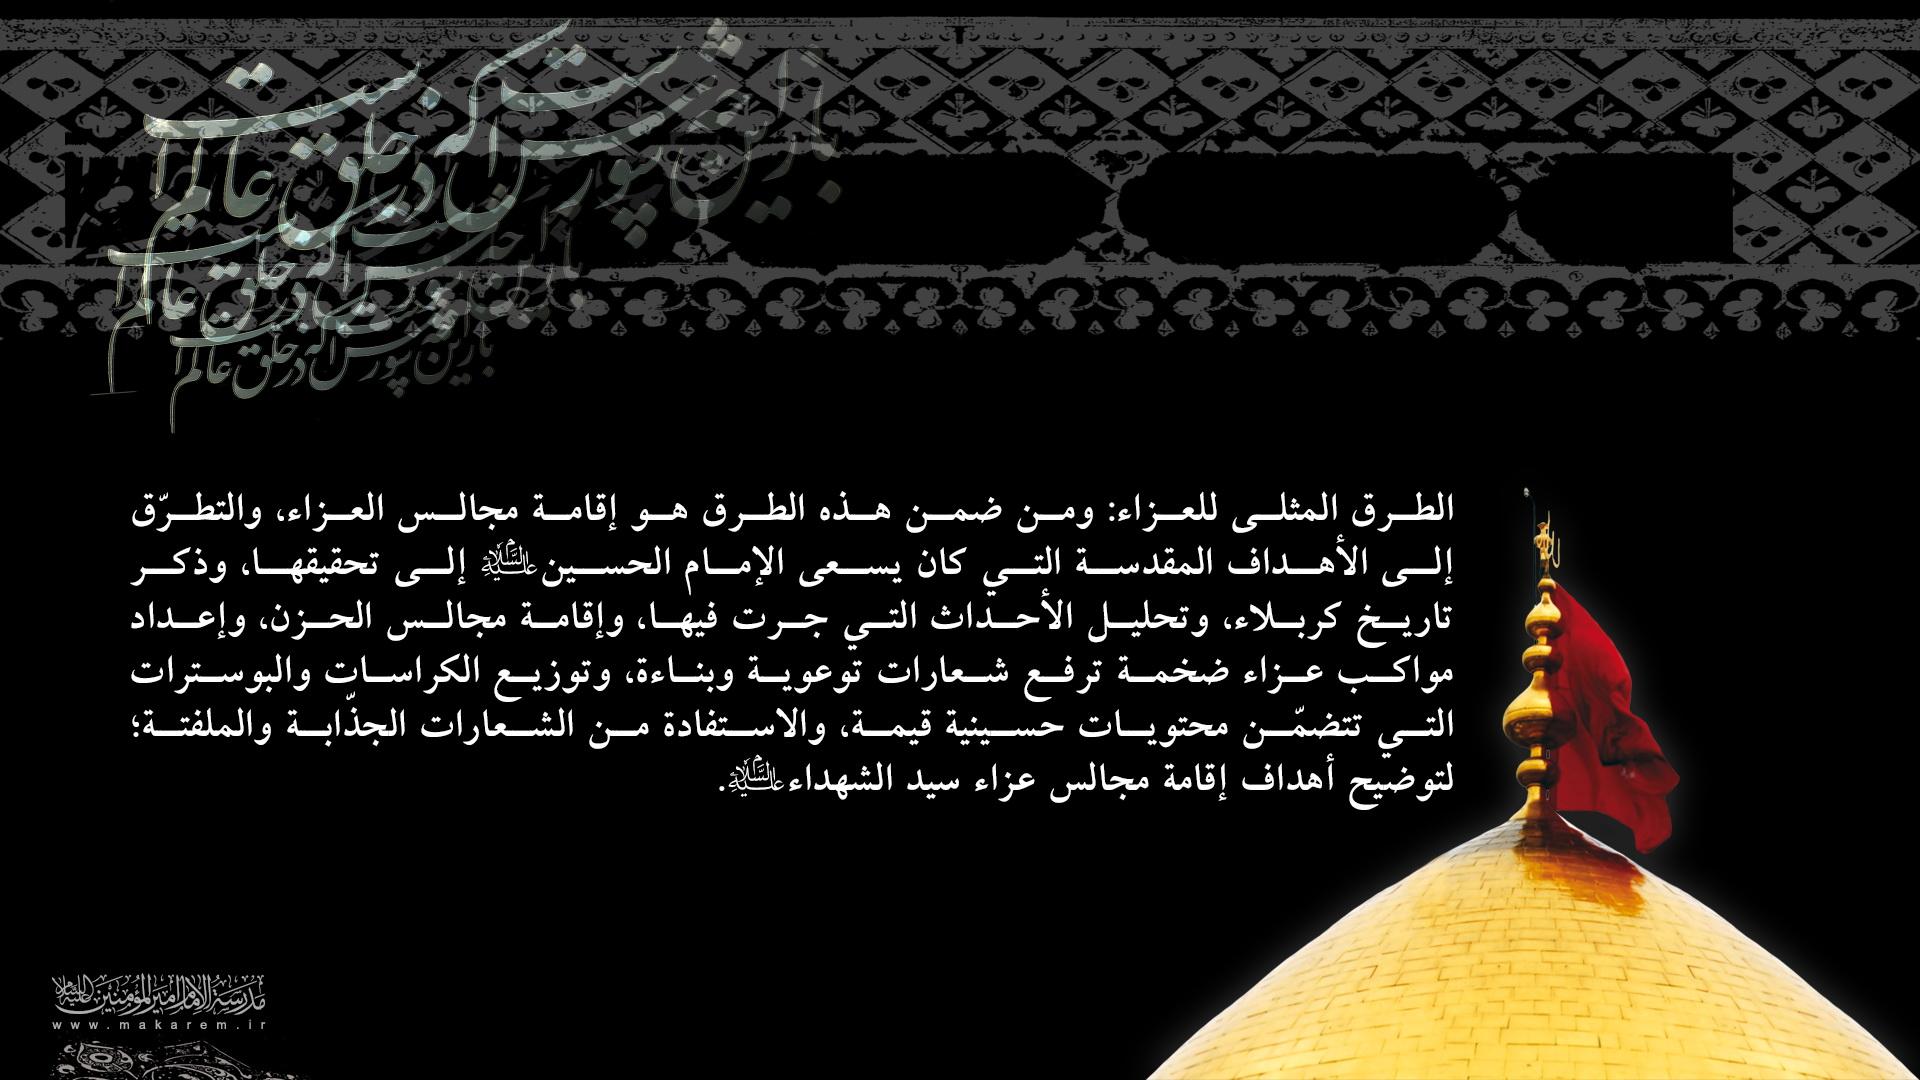 یاسر الاسرار-مدرسه الامام امیر المومنین (ع)